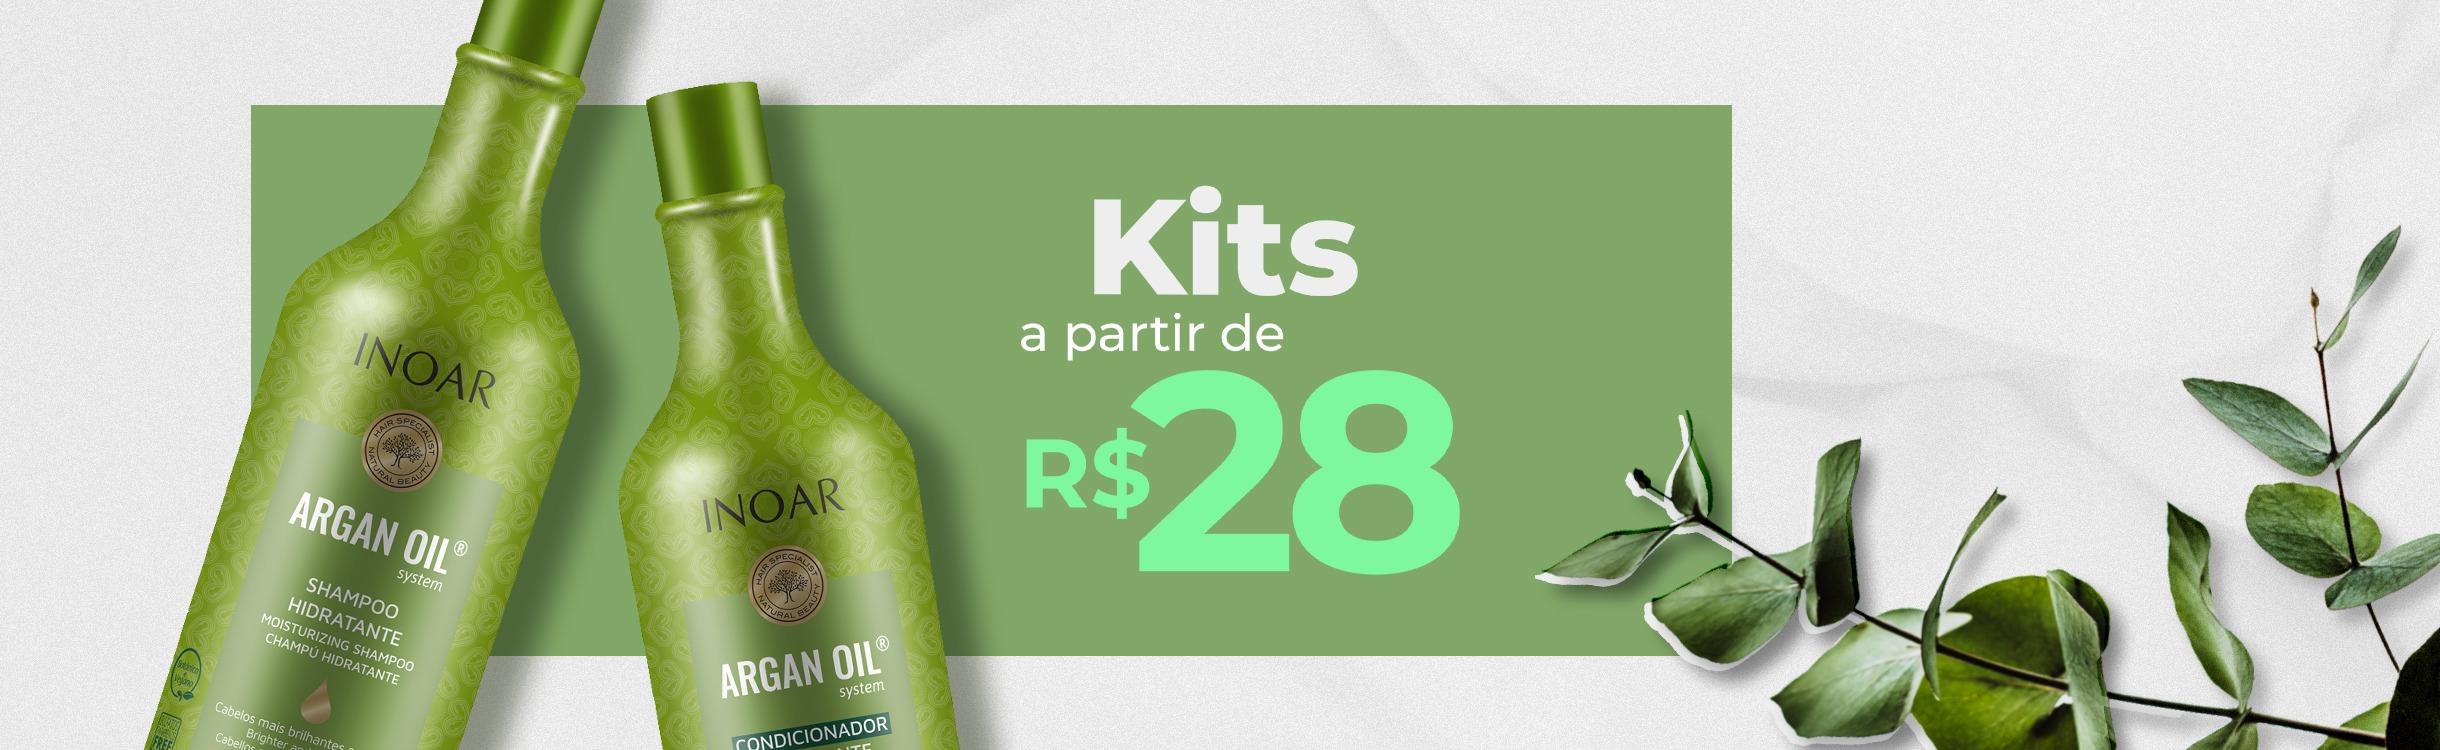 Kits a partir de R$28